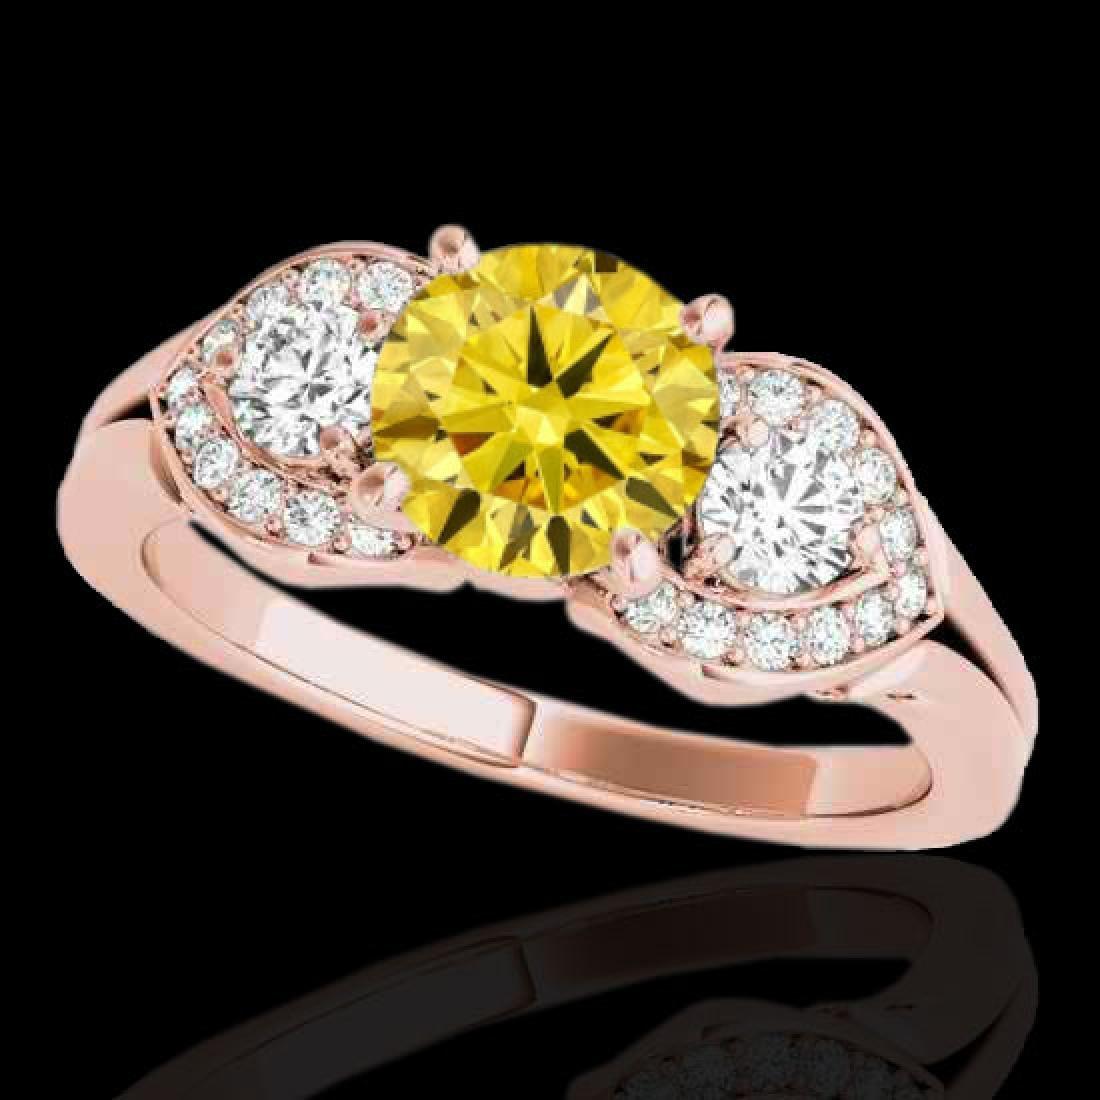 1.7 CTW Certified Si Intense Yellow Diamond 3 Stone